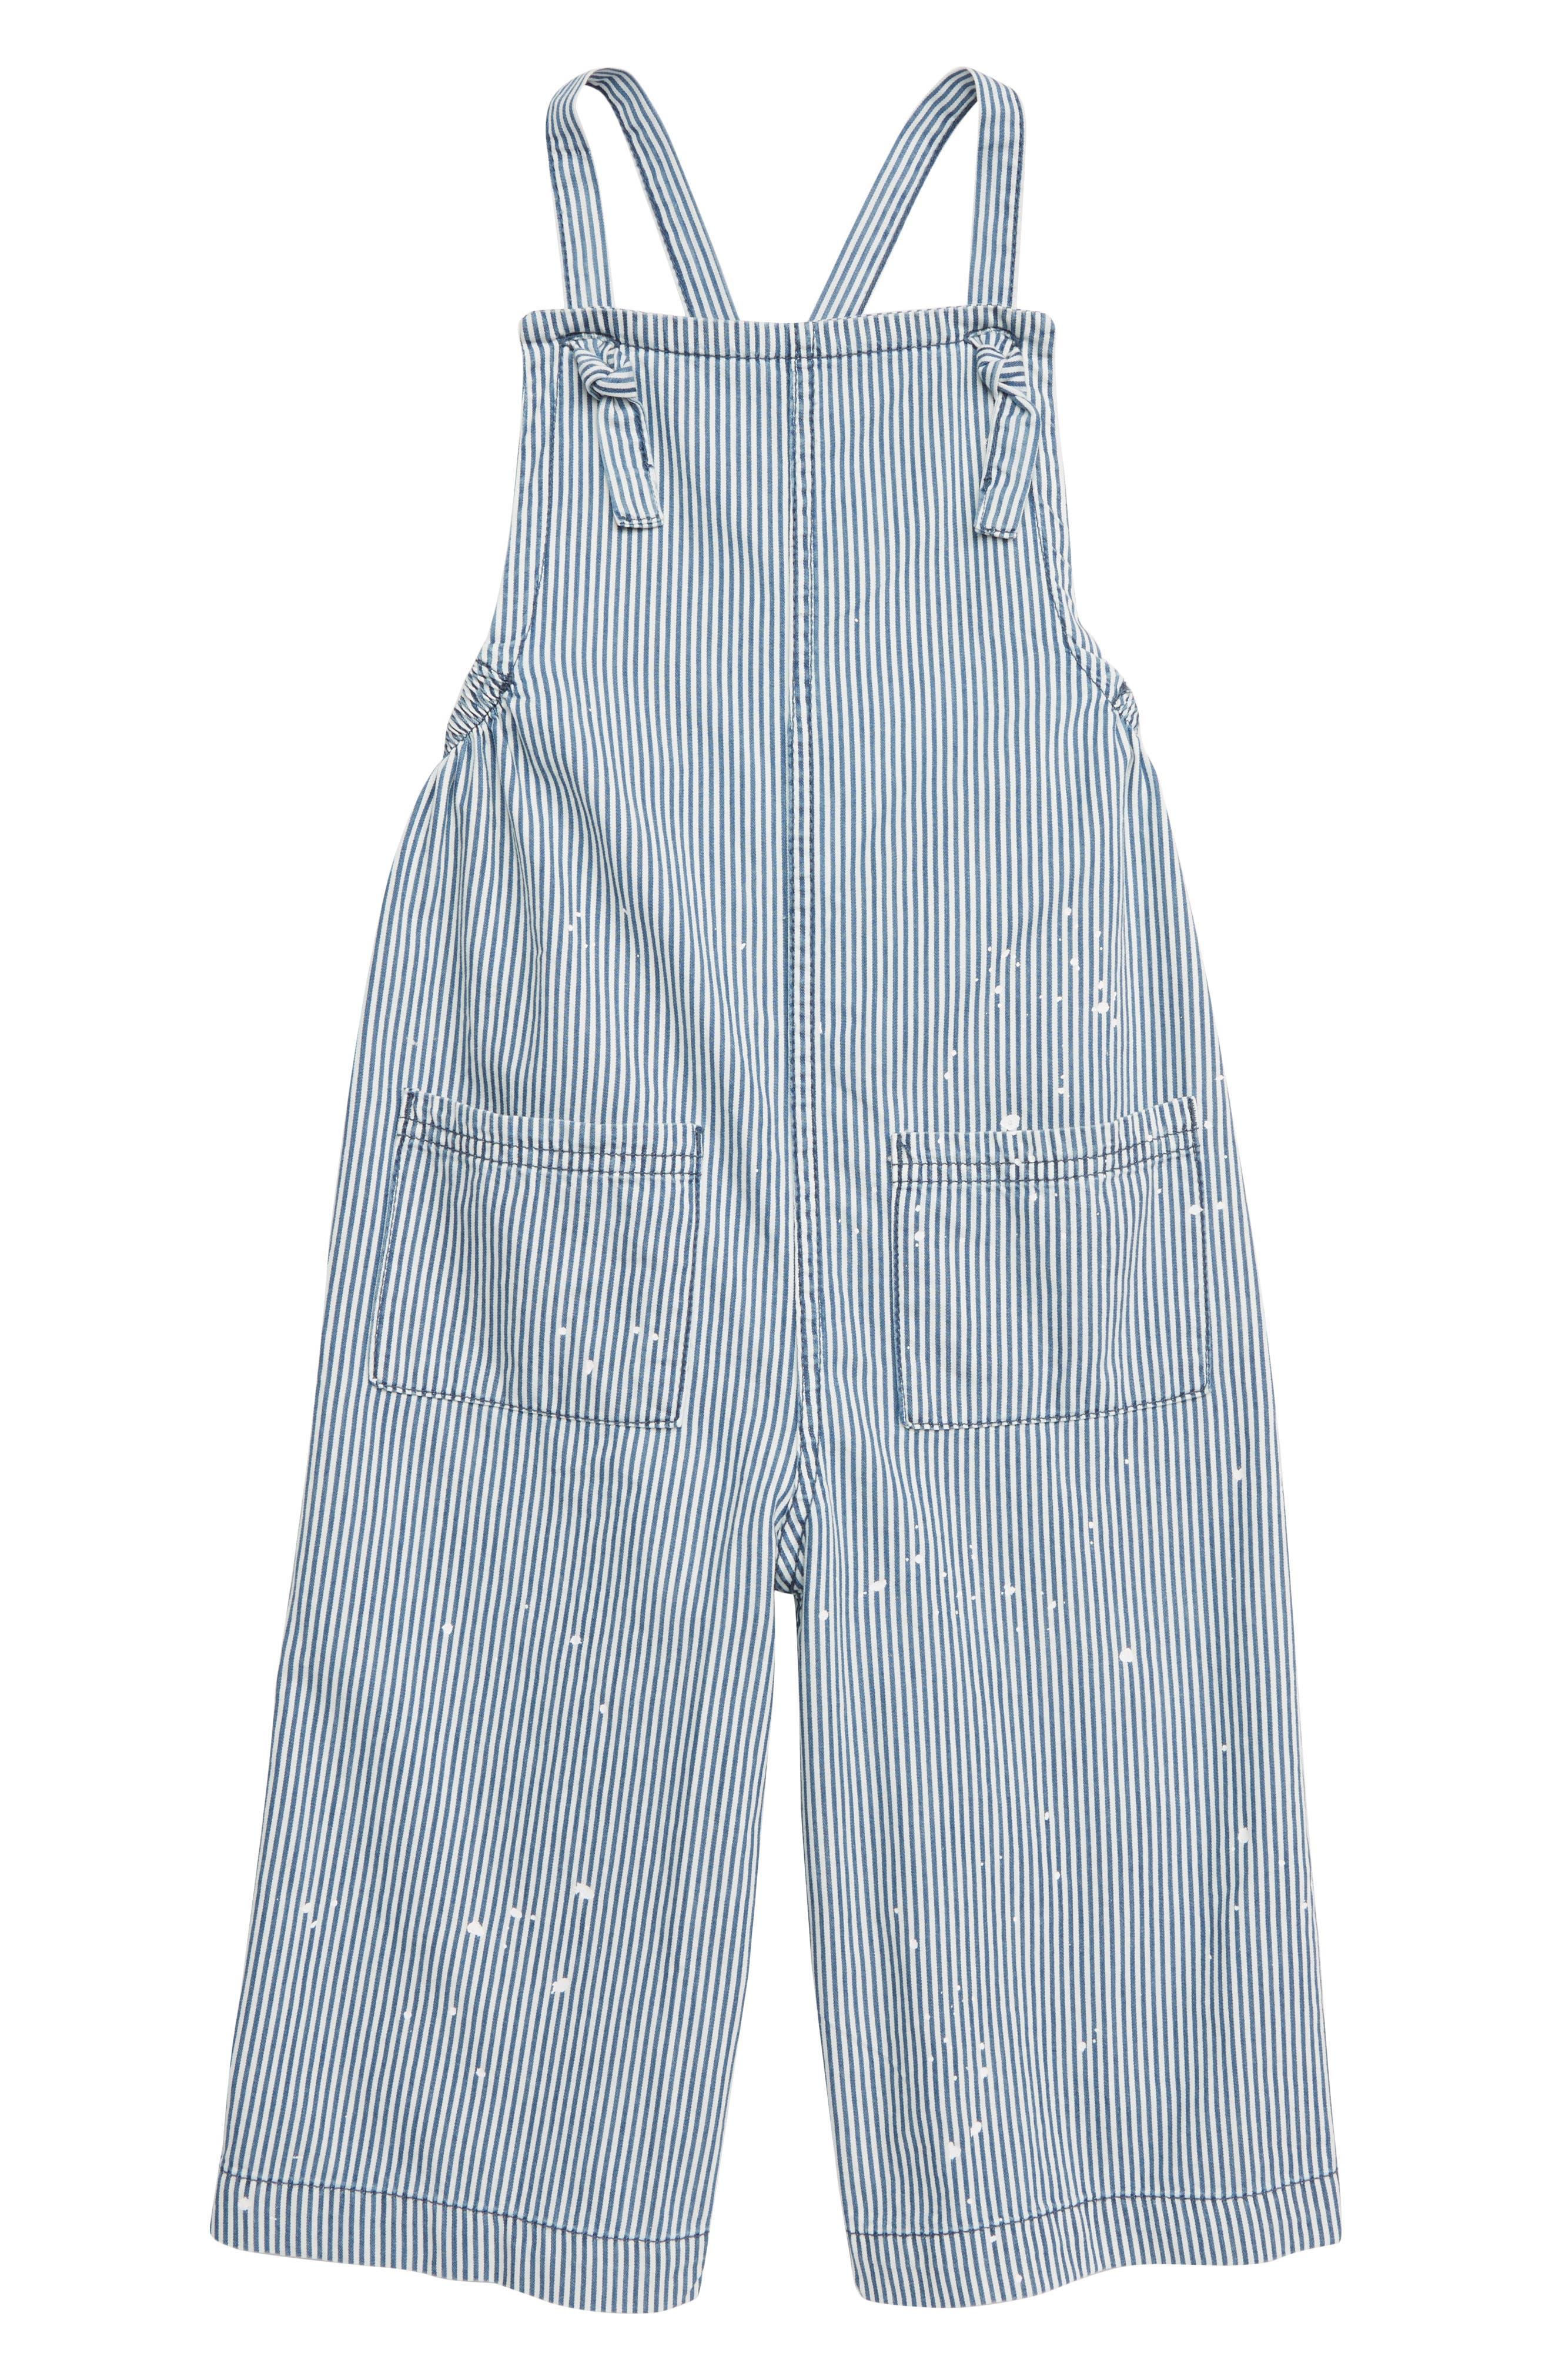 Toddler Girls Stem Railroad Stripe Overalls Size 2T  Blue